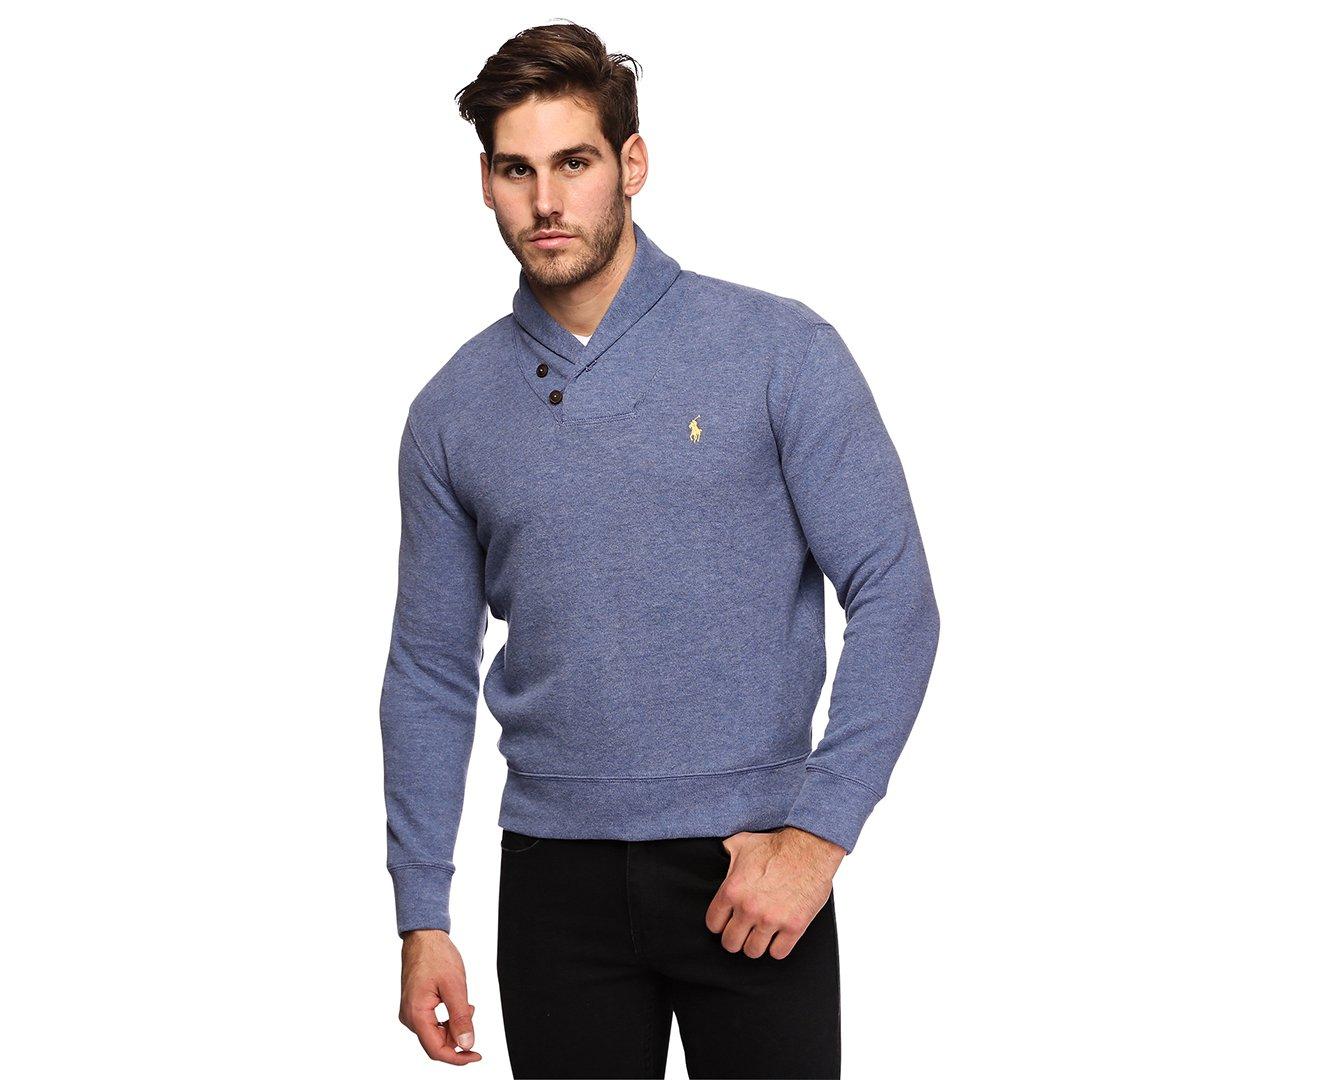 Polo Ralph Lauren Mens French Rib Shawl Neck Sweater (Small, Blue)